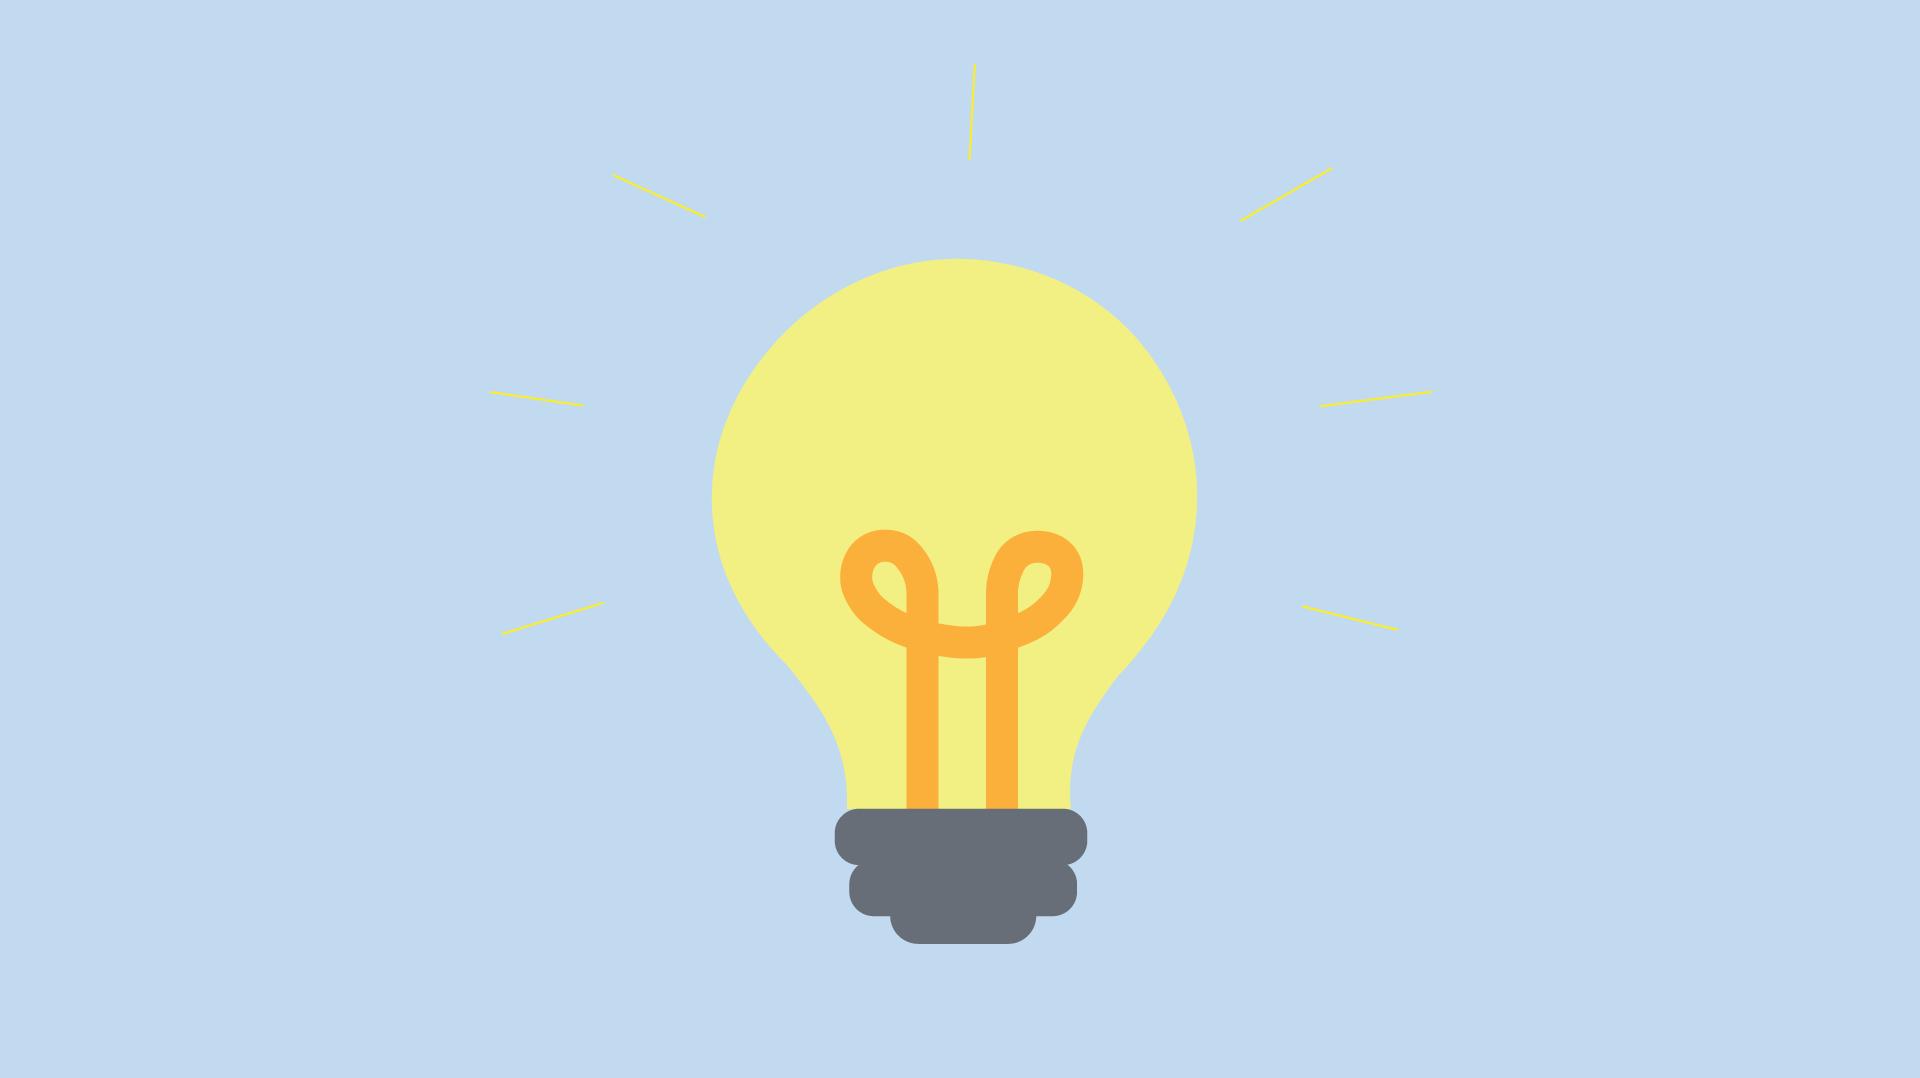 Marketing Guide: Mangler du ideer til nyt content? - makeitmedia